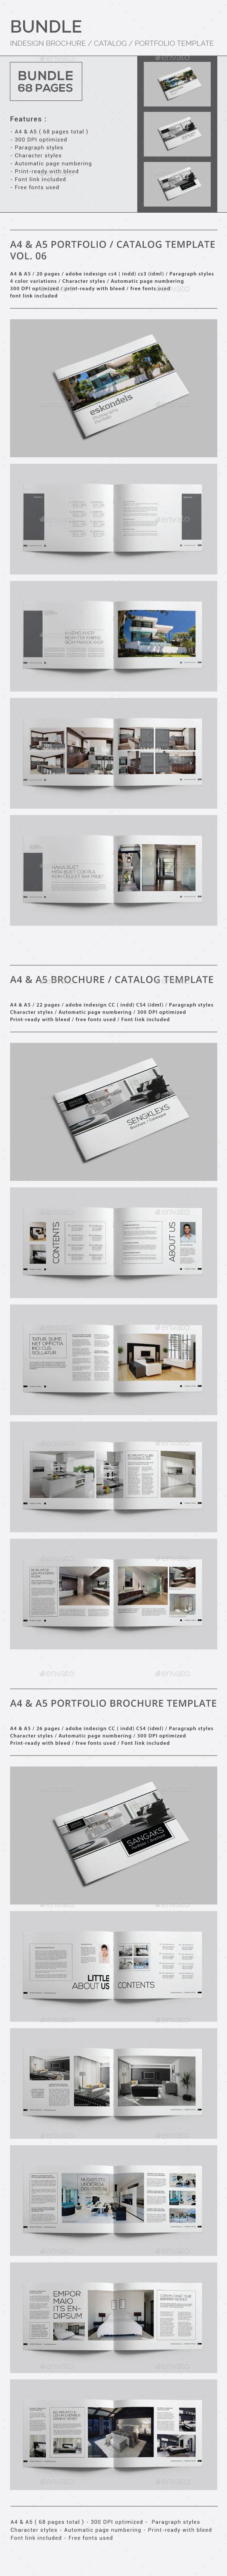 InDesign Brochure Graphics, Designs & Templates